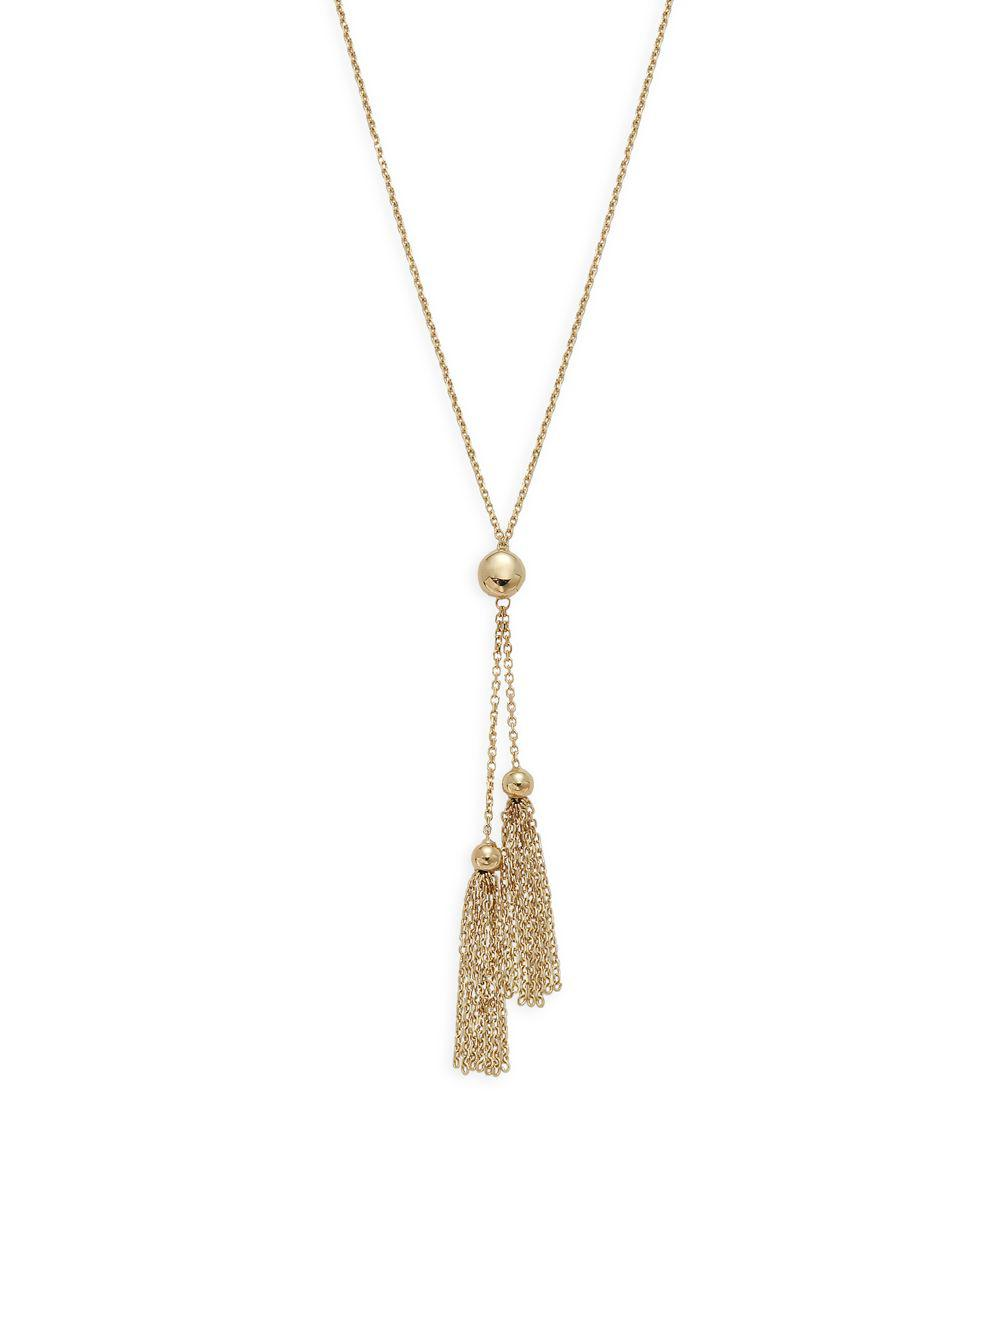 Lyst - Saks Fifth Avenue 14k Yellow Gold Tassel Necklace in